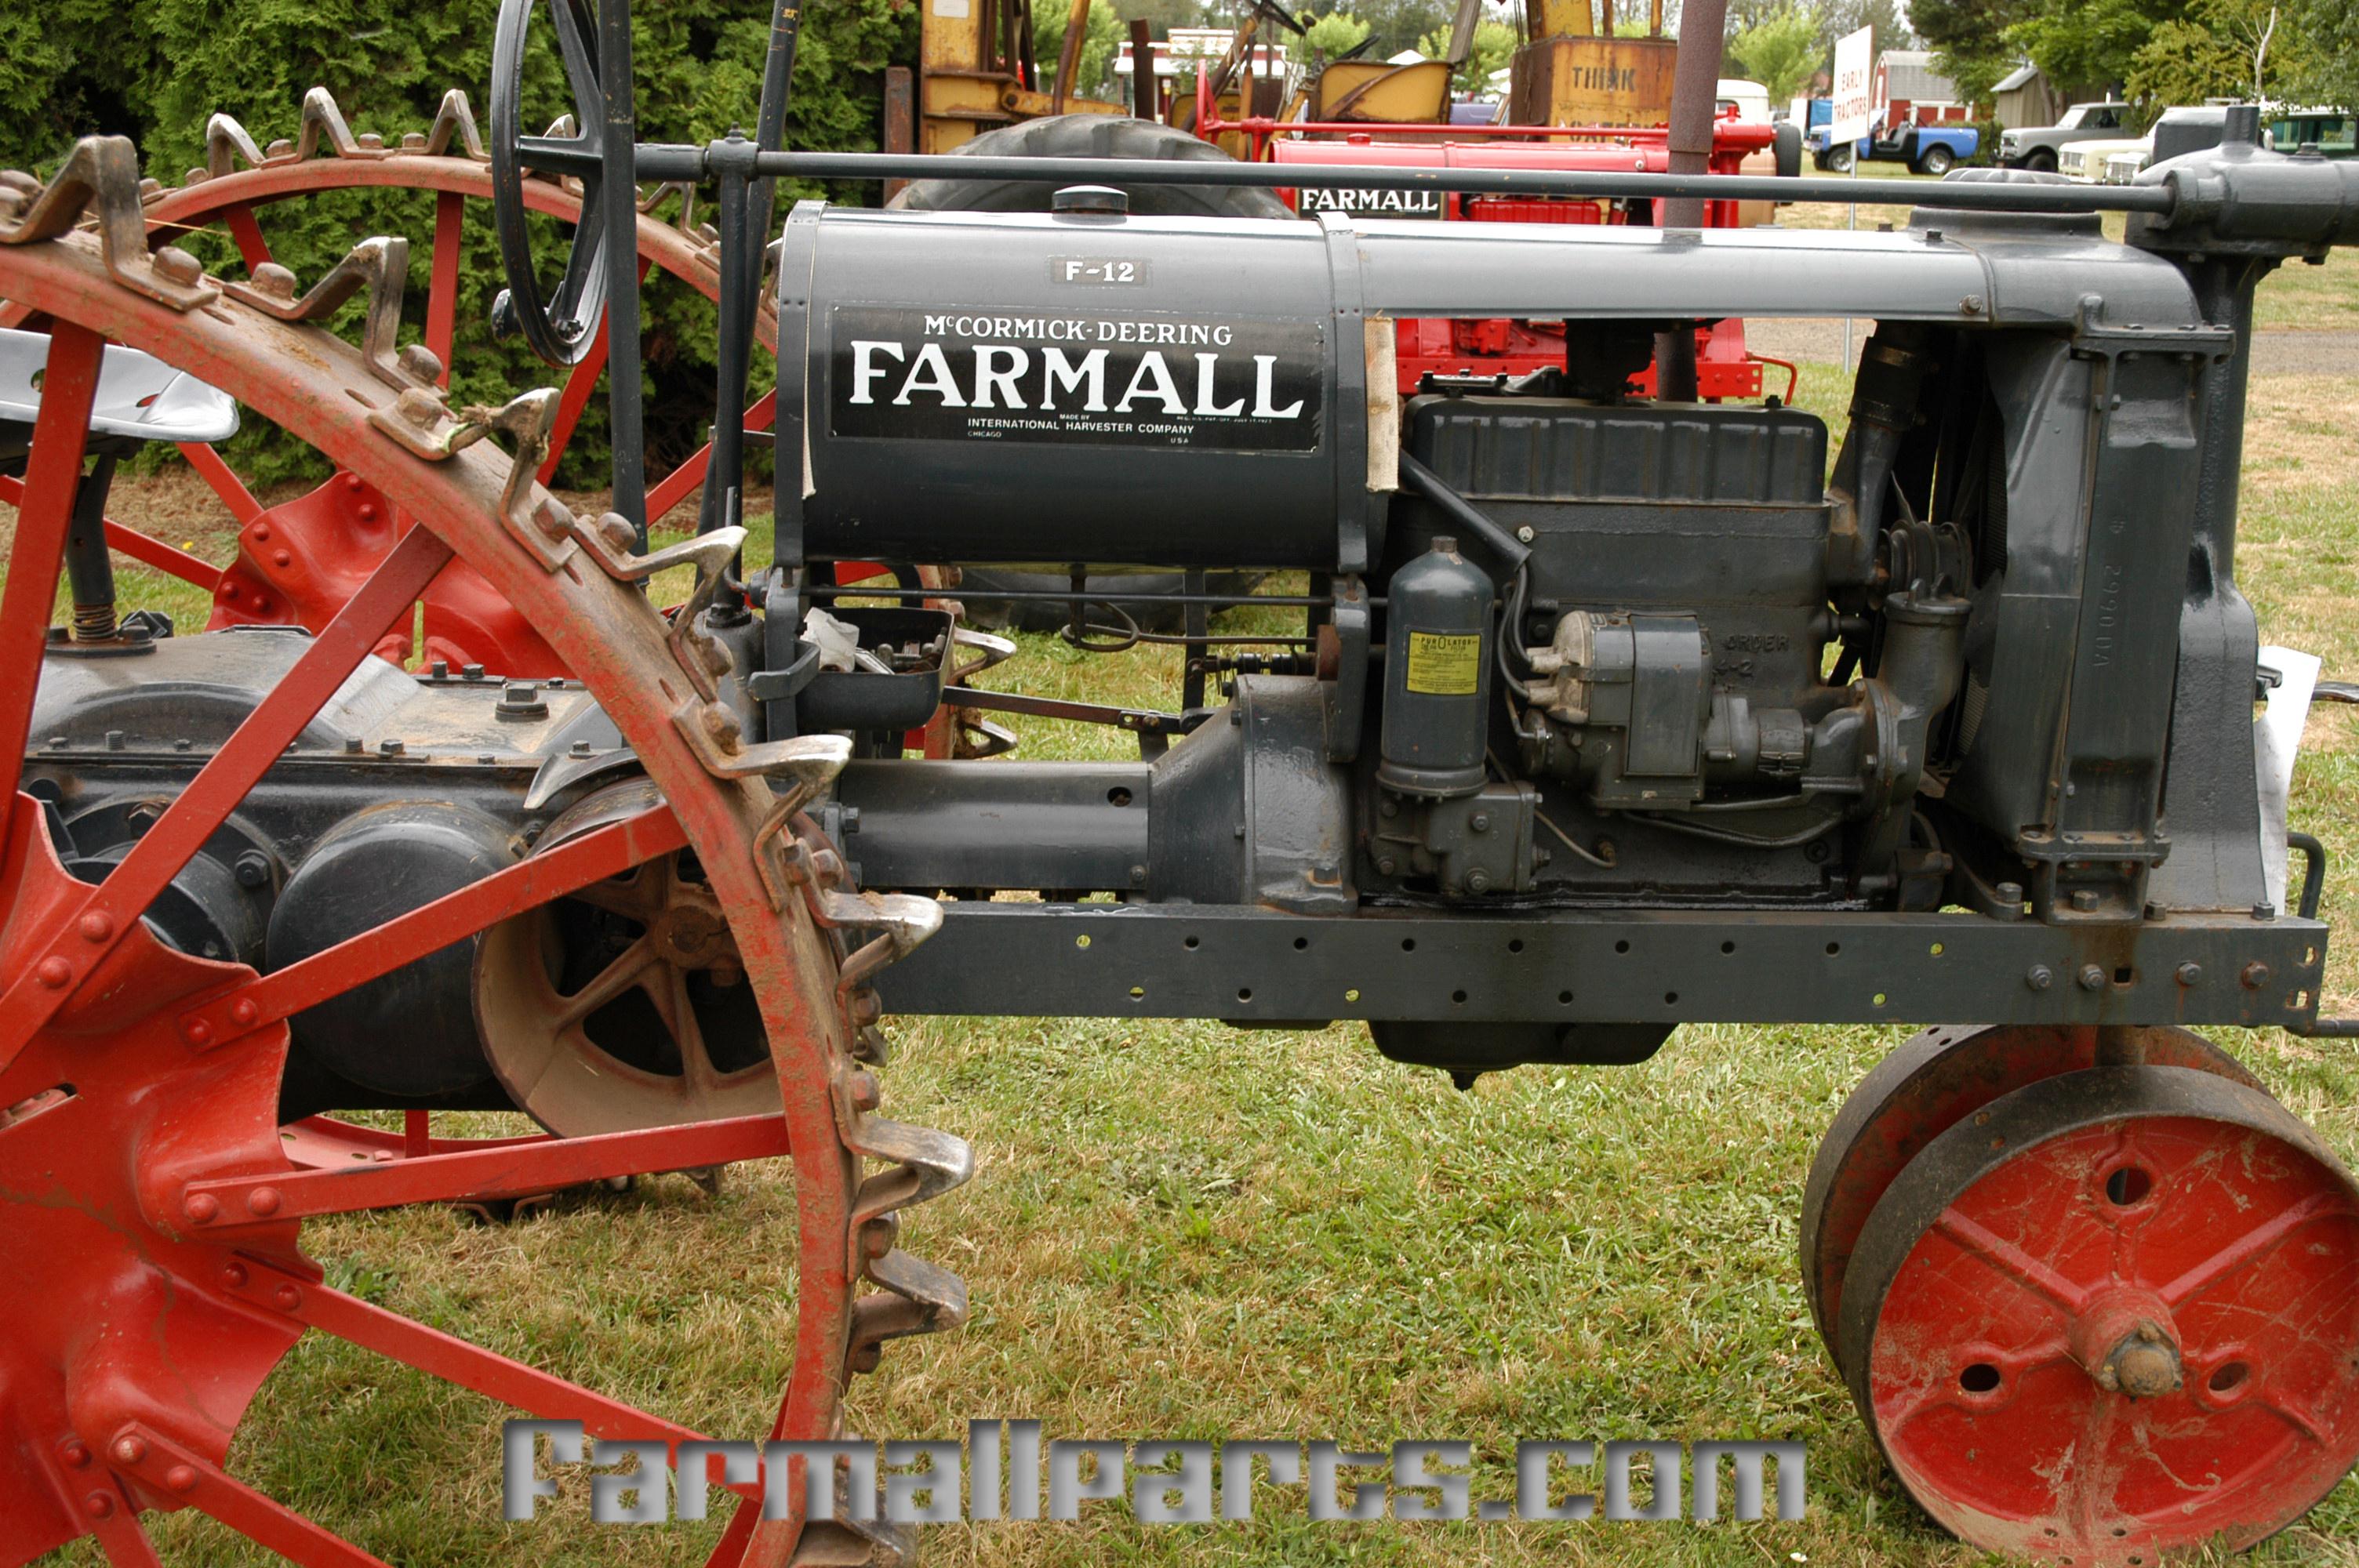 Farmall Steel Wheels : Farmall parts international harvester tractor